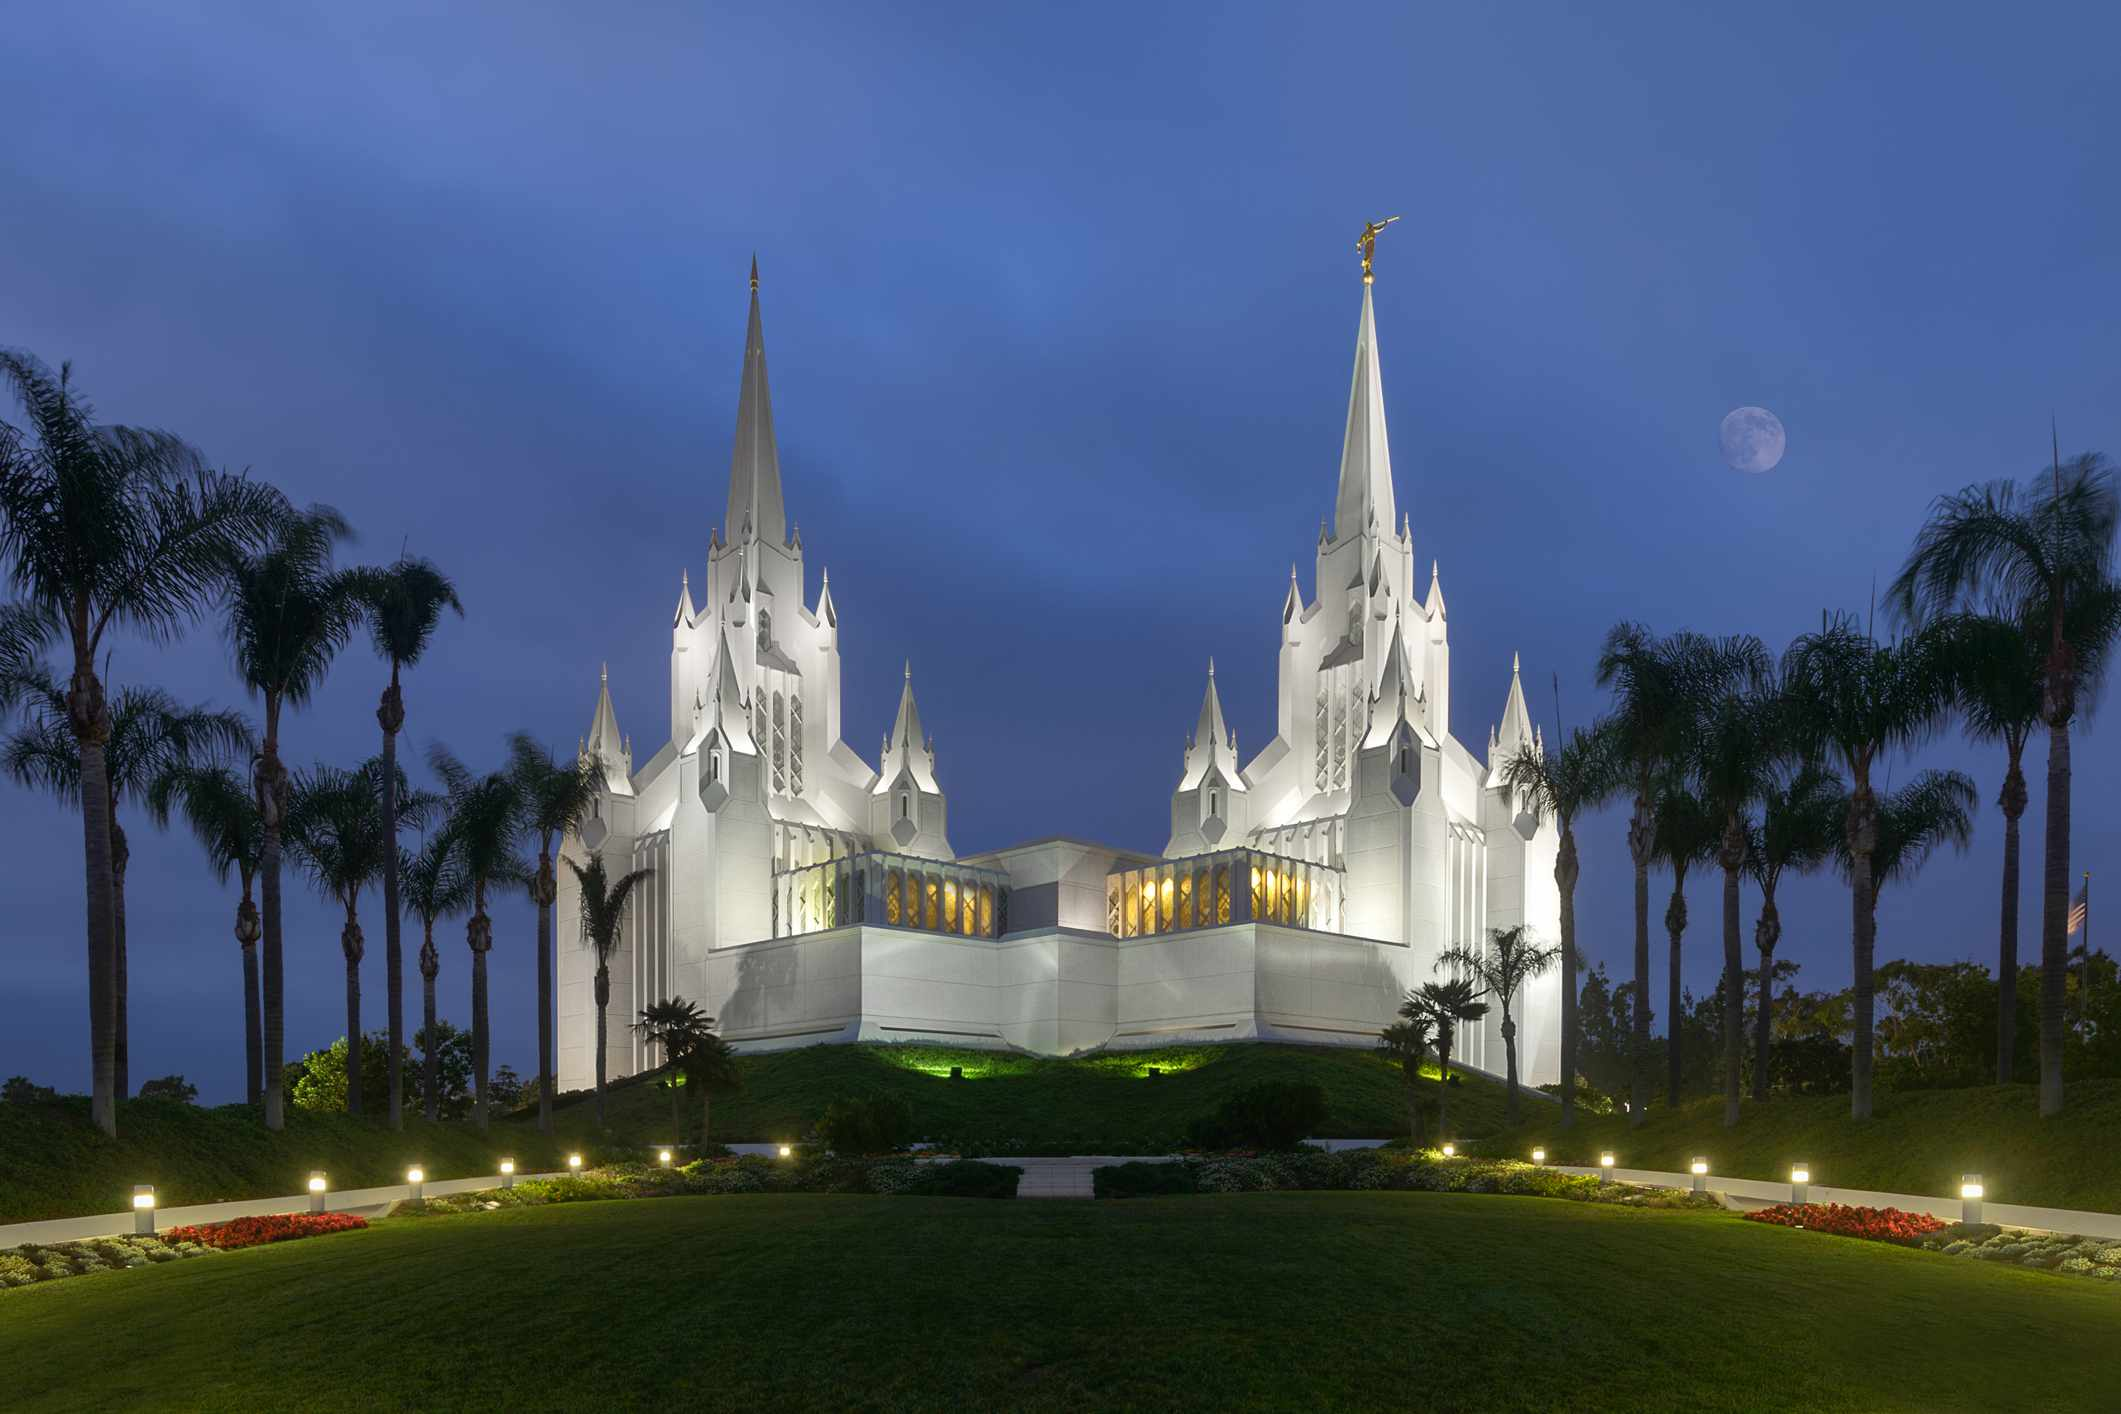 California Mormon Temple at night in California